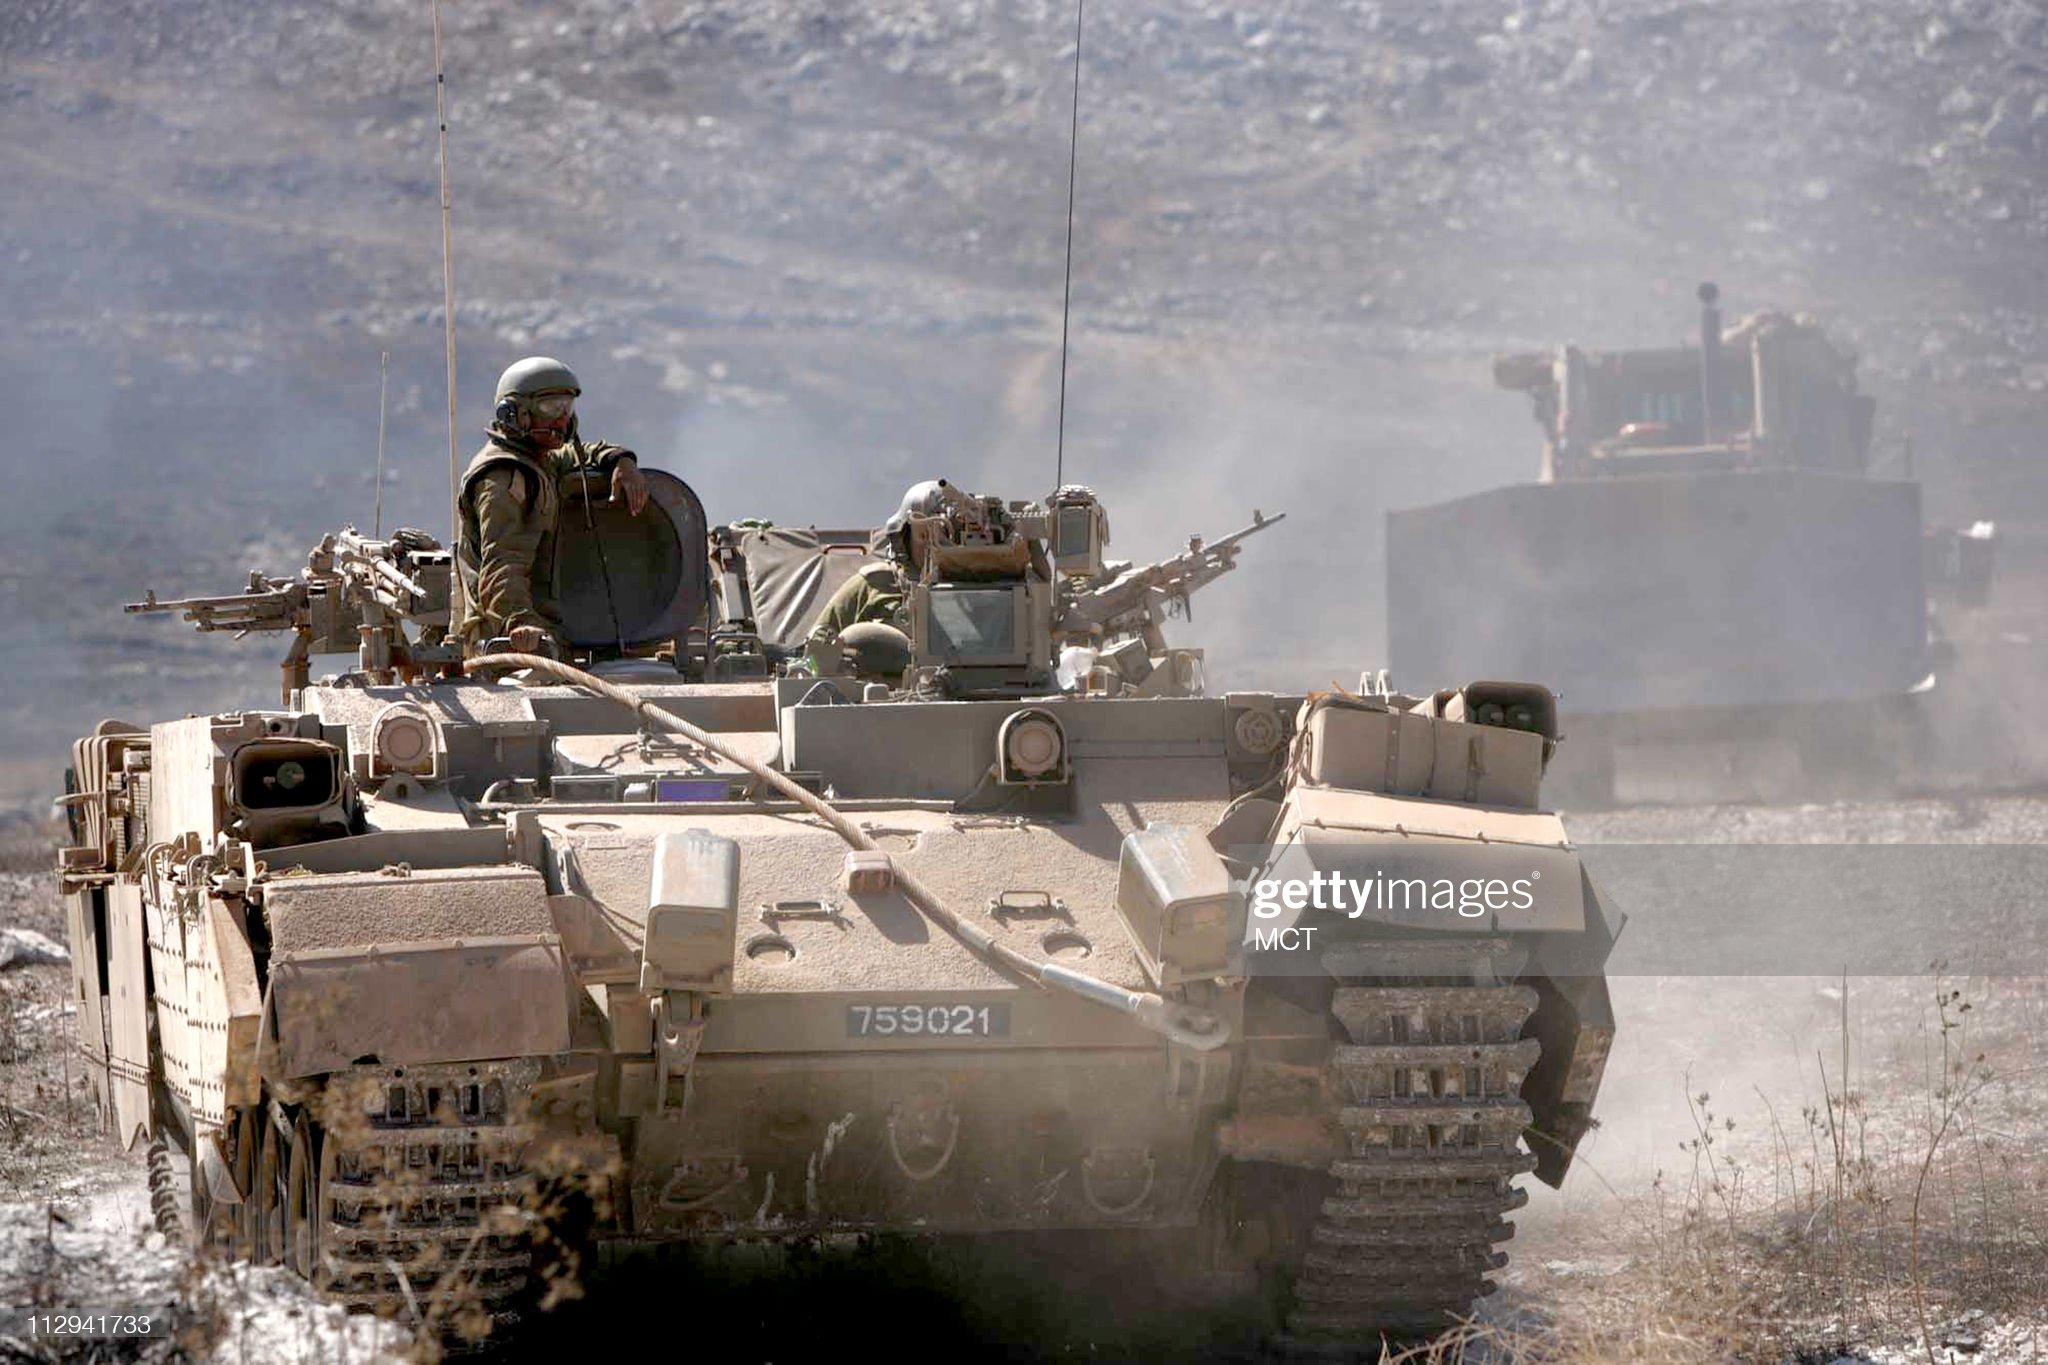 https://media.gettyimages.com/photos/israeli-tanks-in-bint-jbeil-move-towards-the-lebaneseisraeli-border-picture-id112941733?s=2048x2048